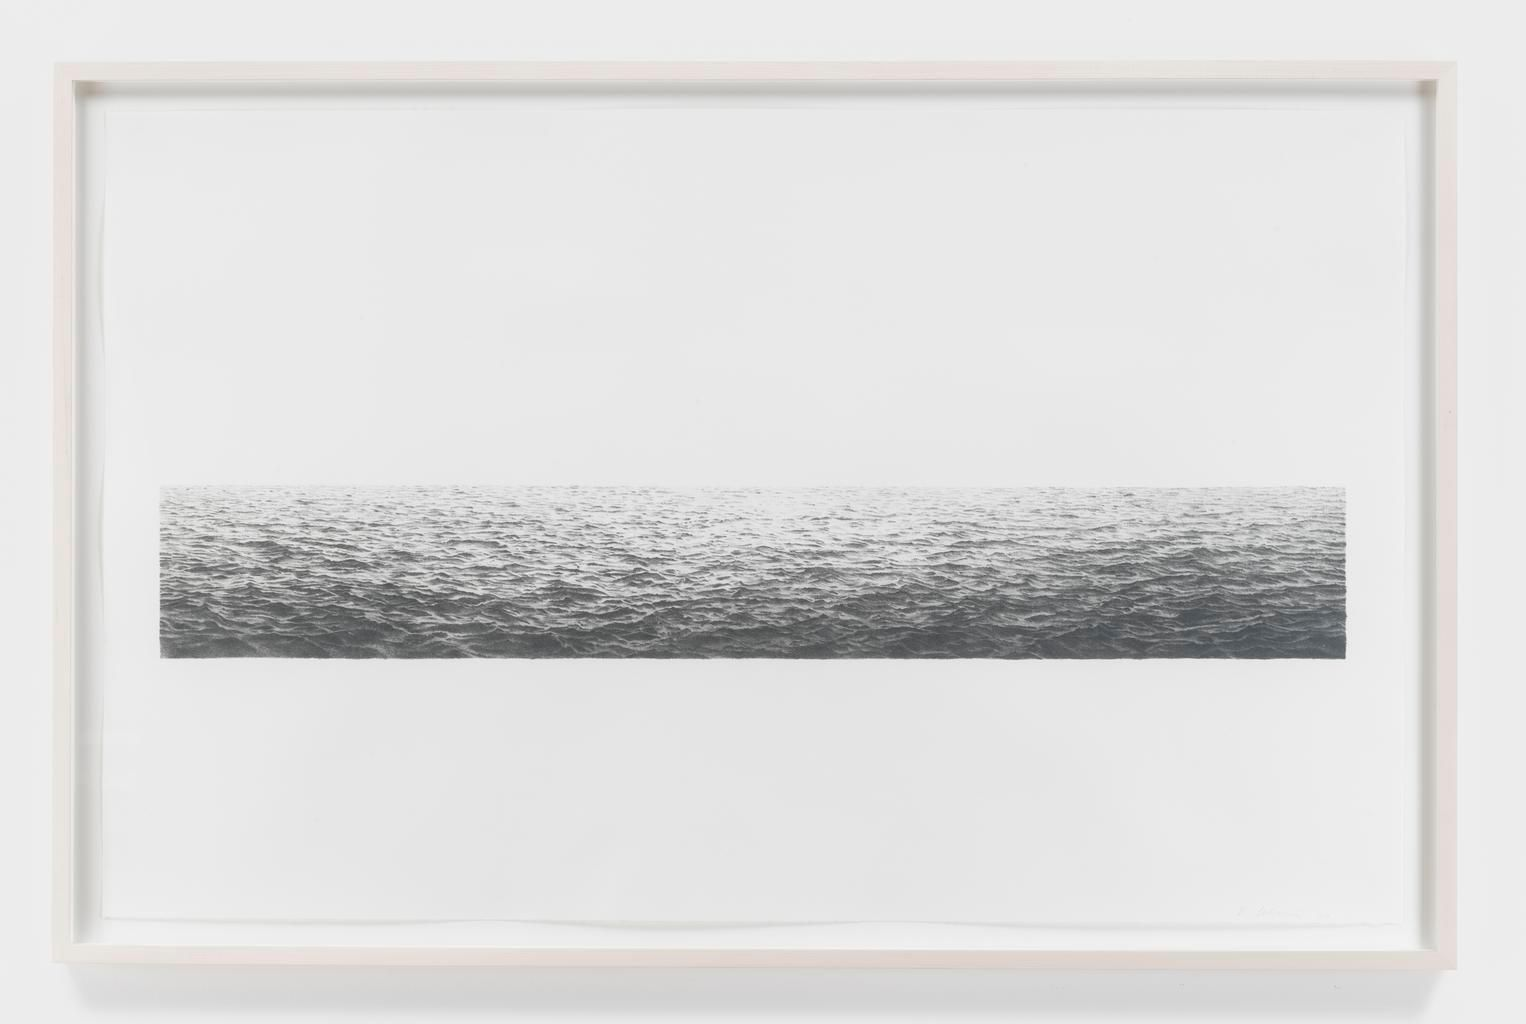 1972, Medium: Lithograph